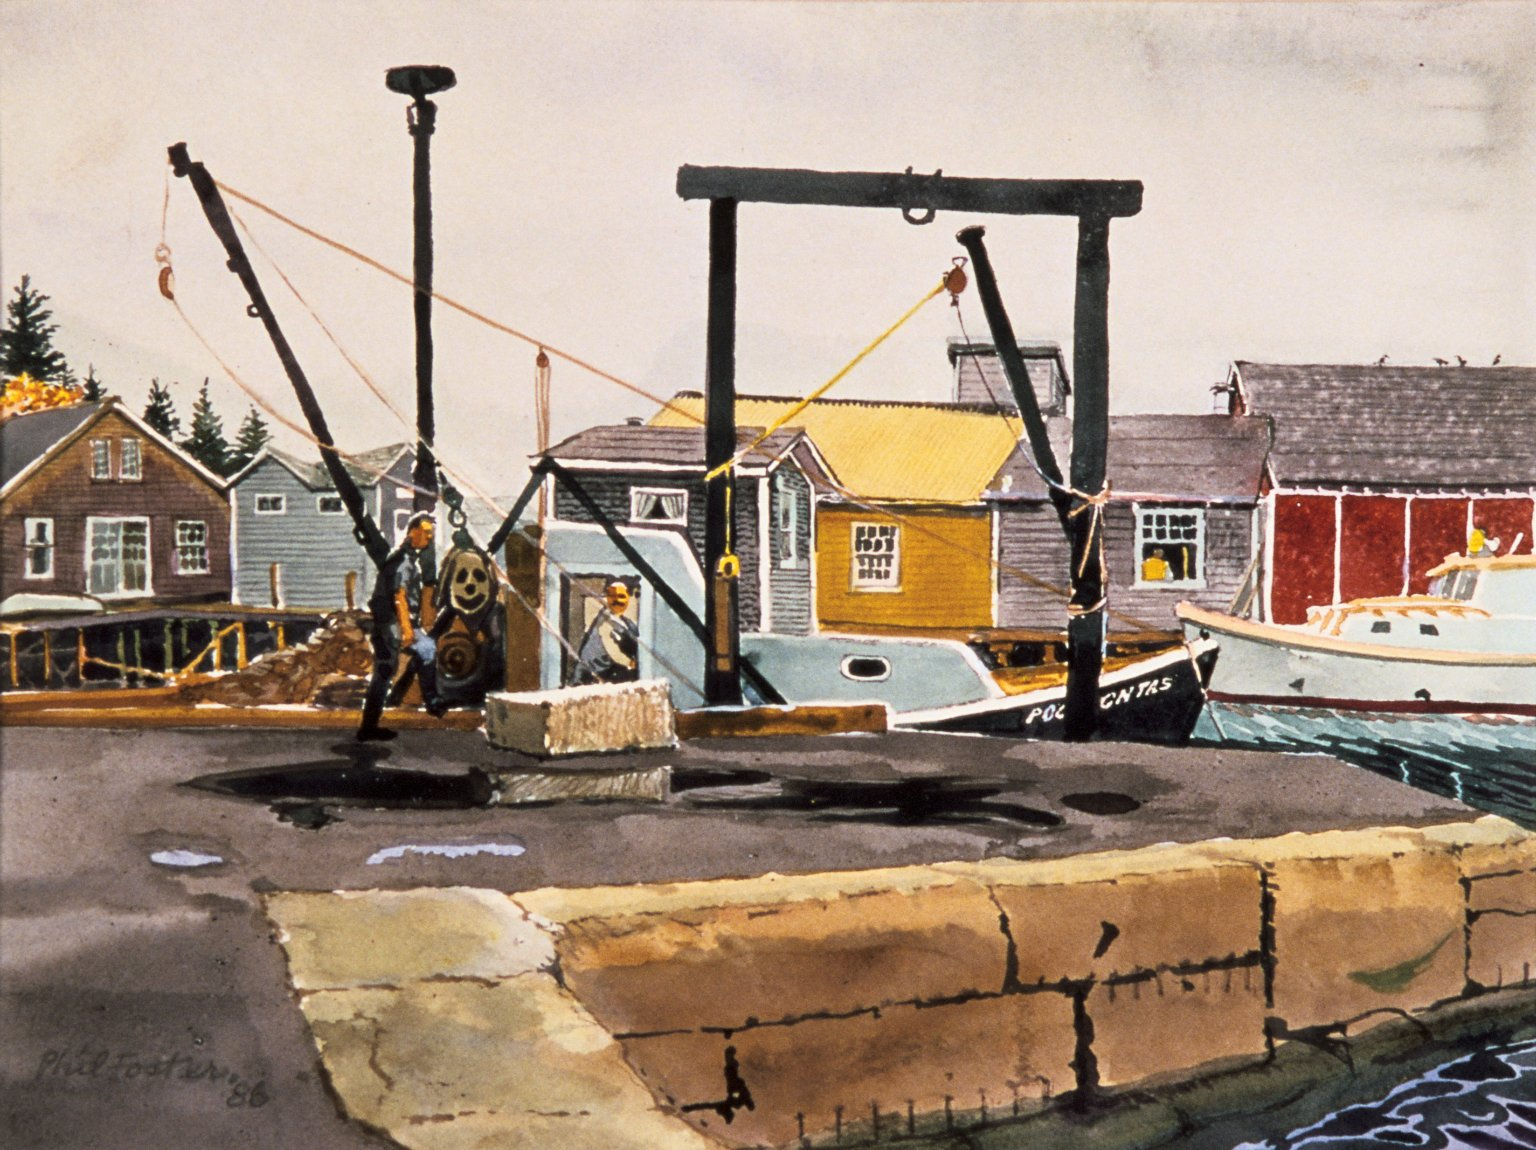 Loading Dock with Boathouses